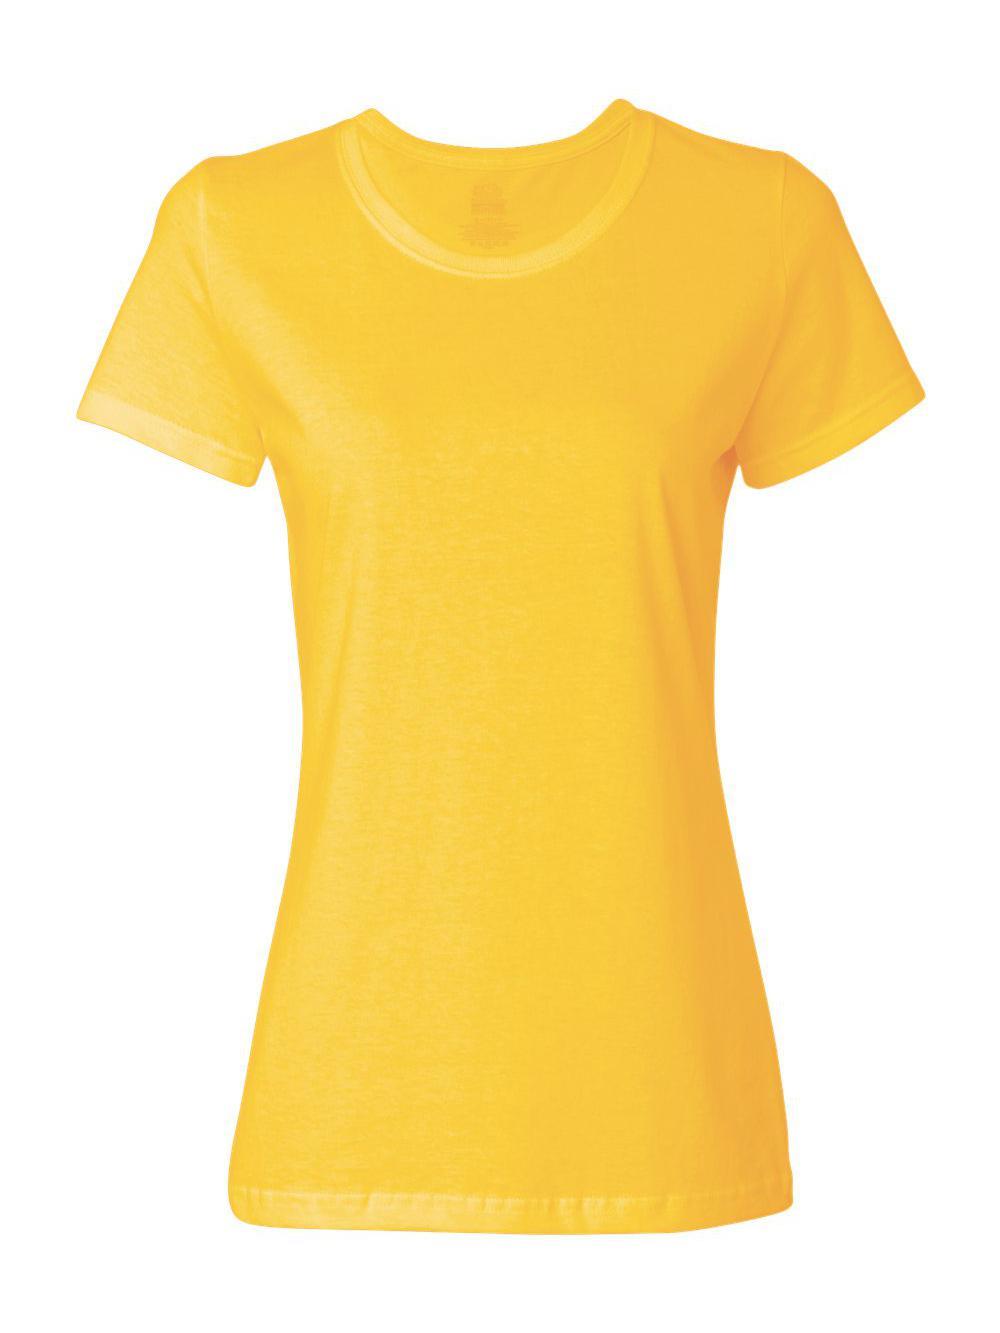 Fruit-of-the-Loom-HD-Cotton-Women-039-s-Short-Sleeve-T-Shirt-L3930R thumbnail 42